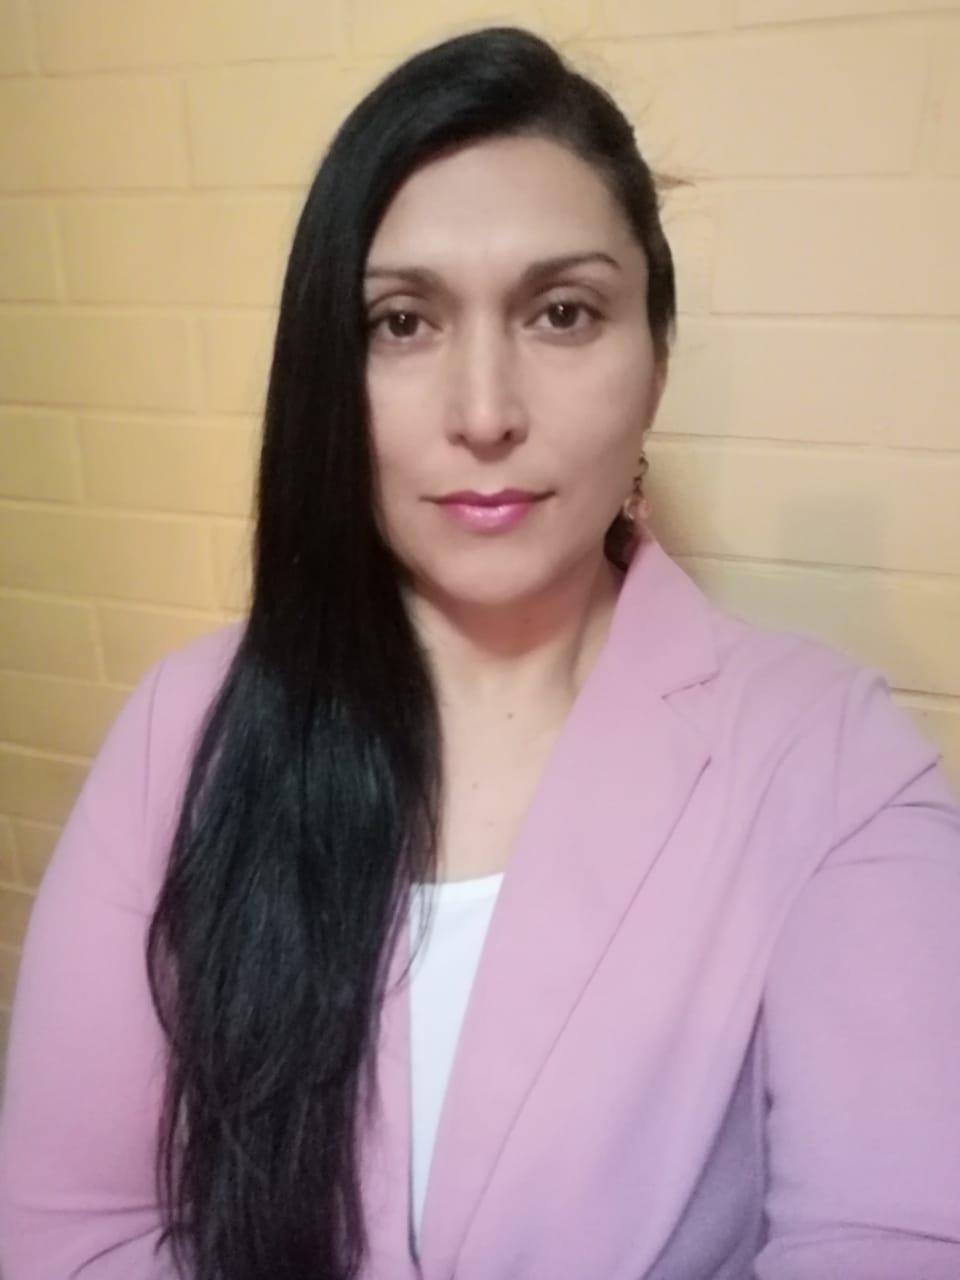 Paola Aedo